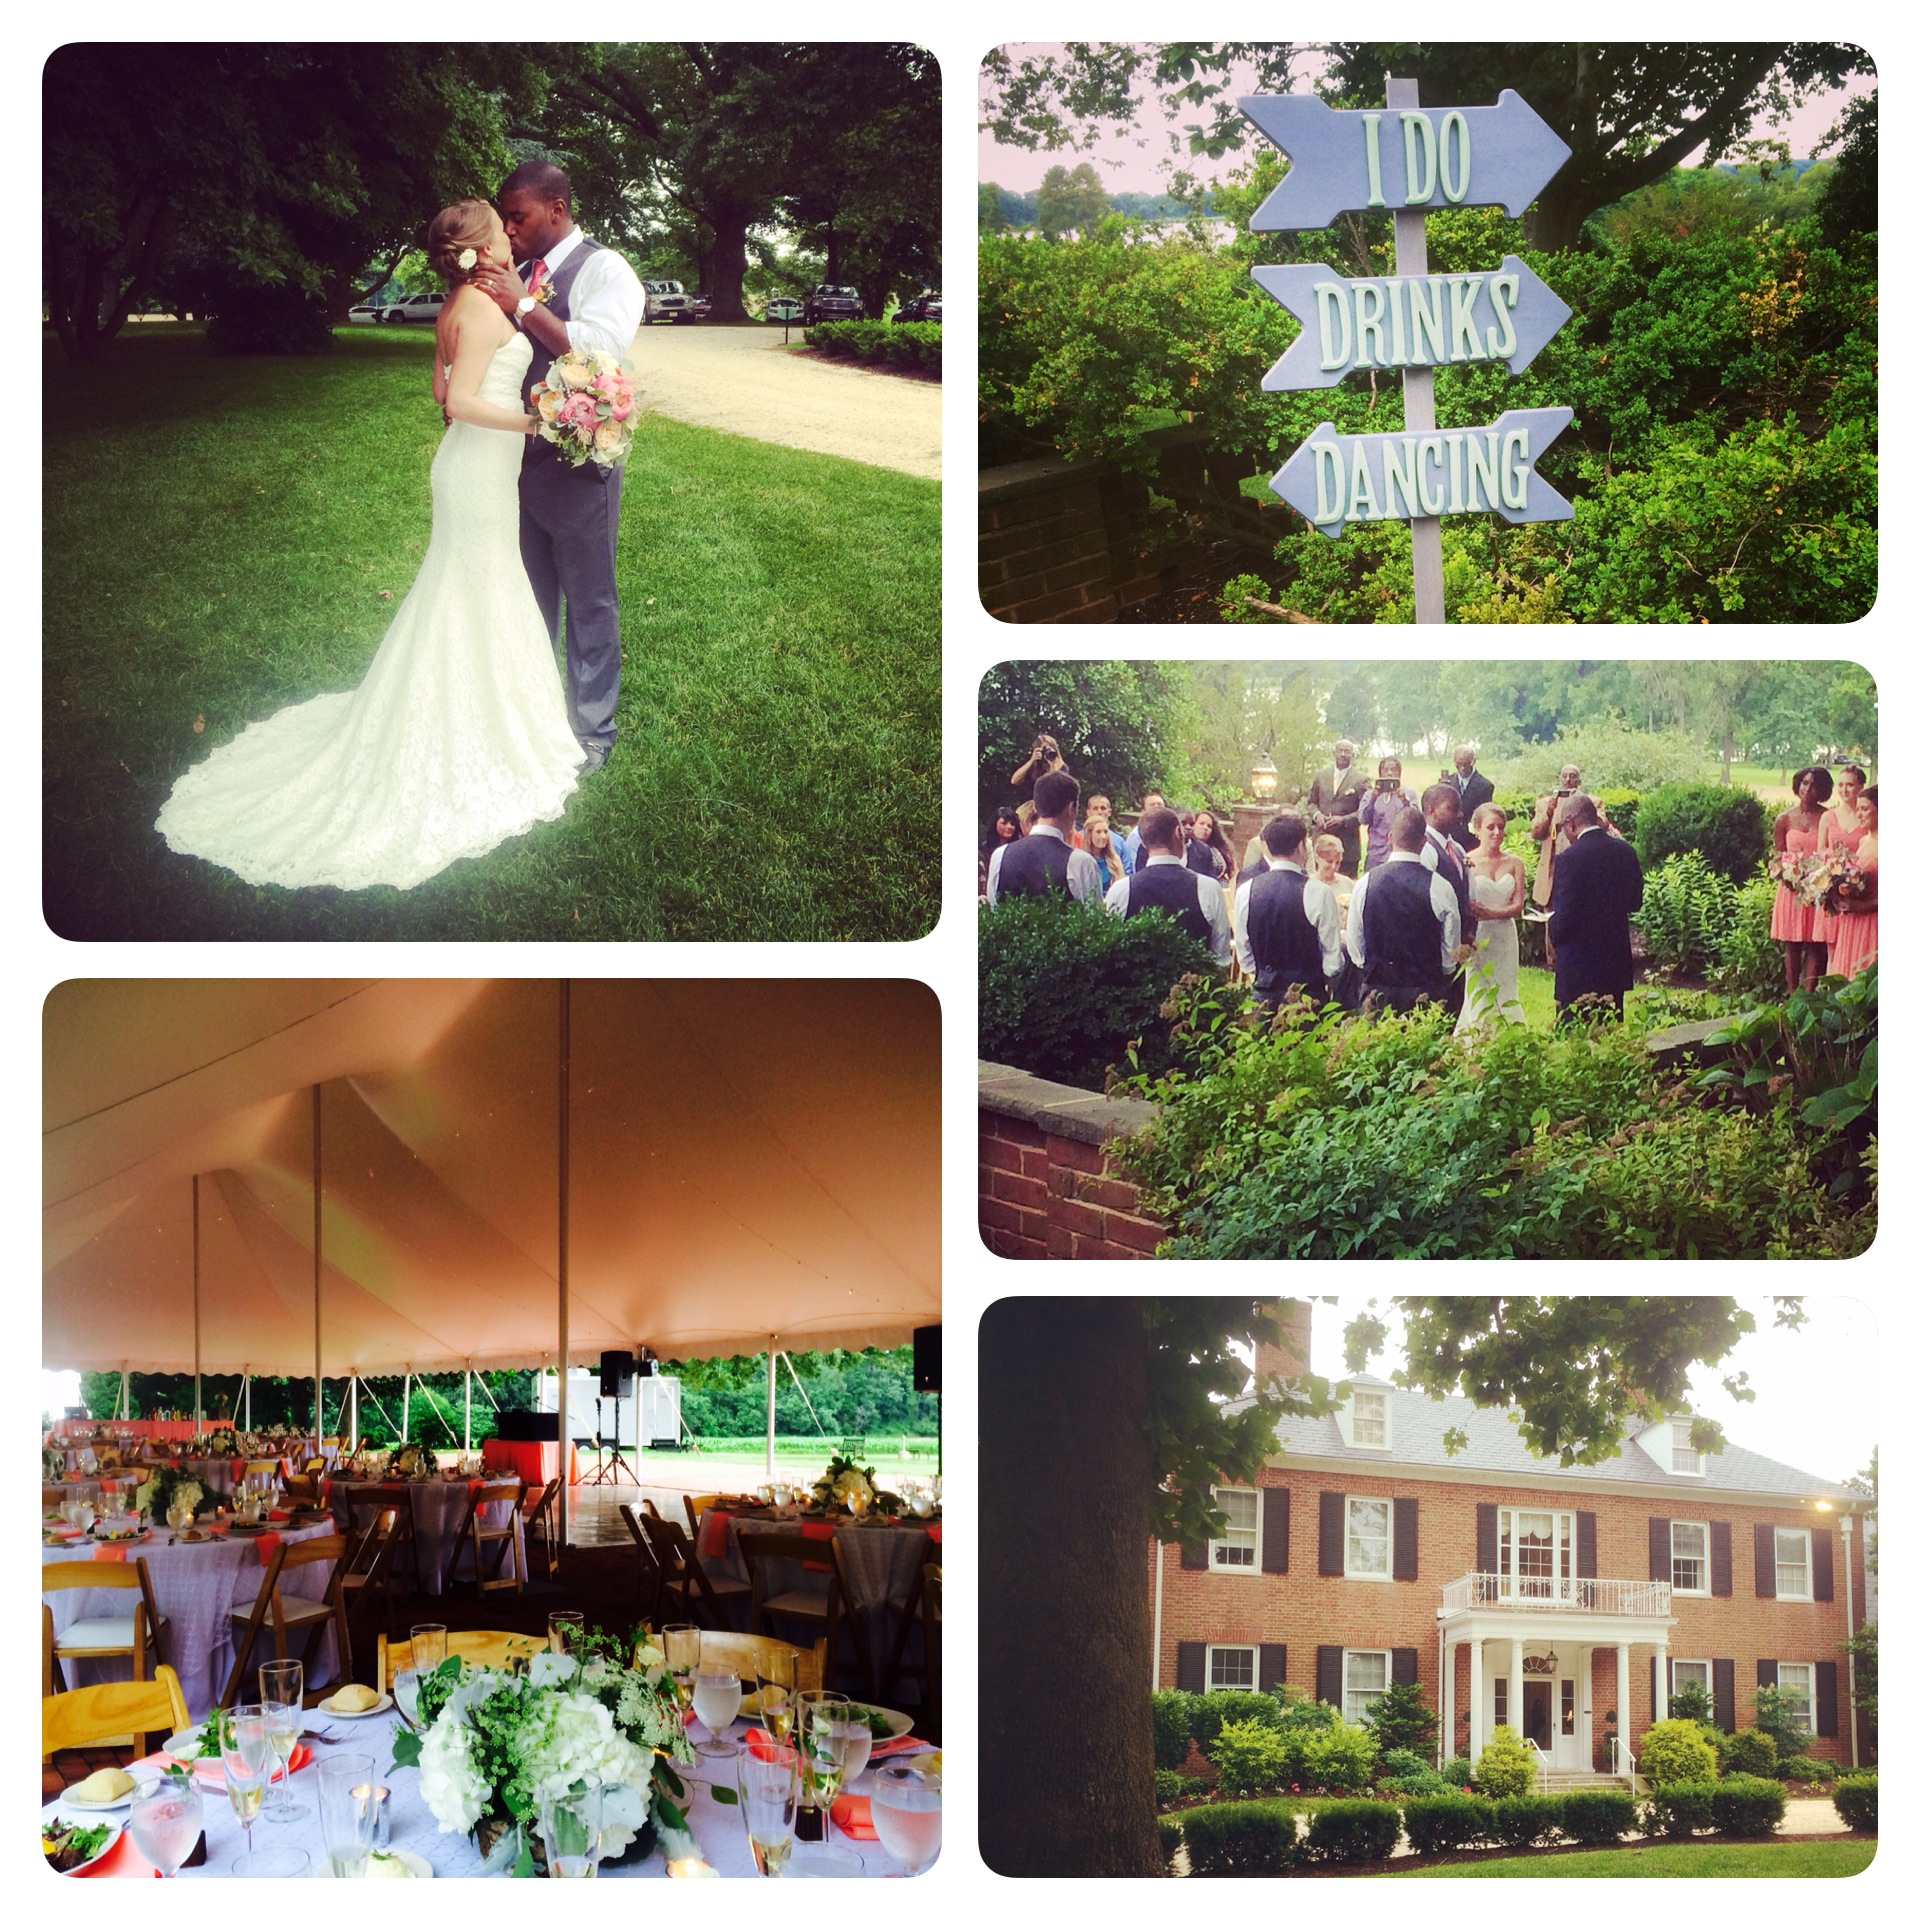 dana u0026 aaron u0027s wedding u0026 reception at brittland manor friendly